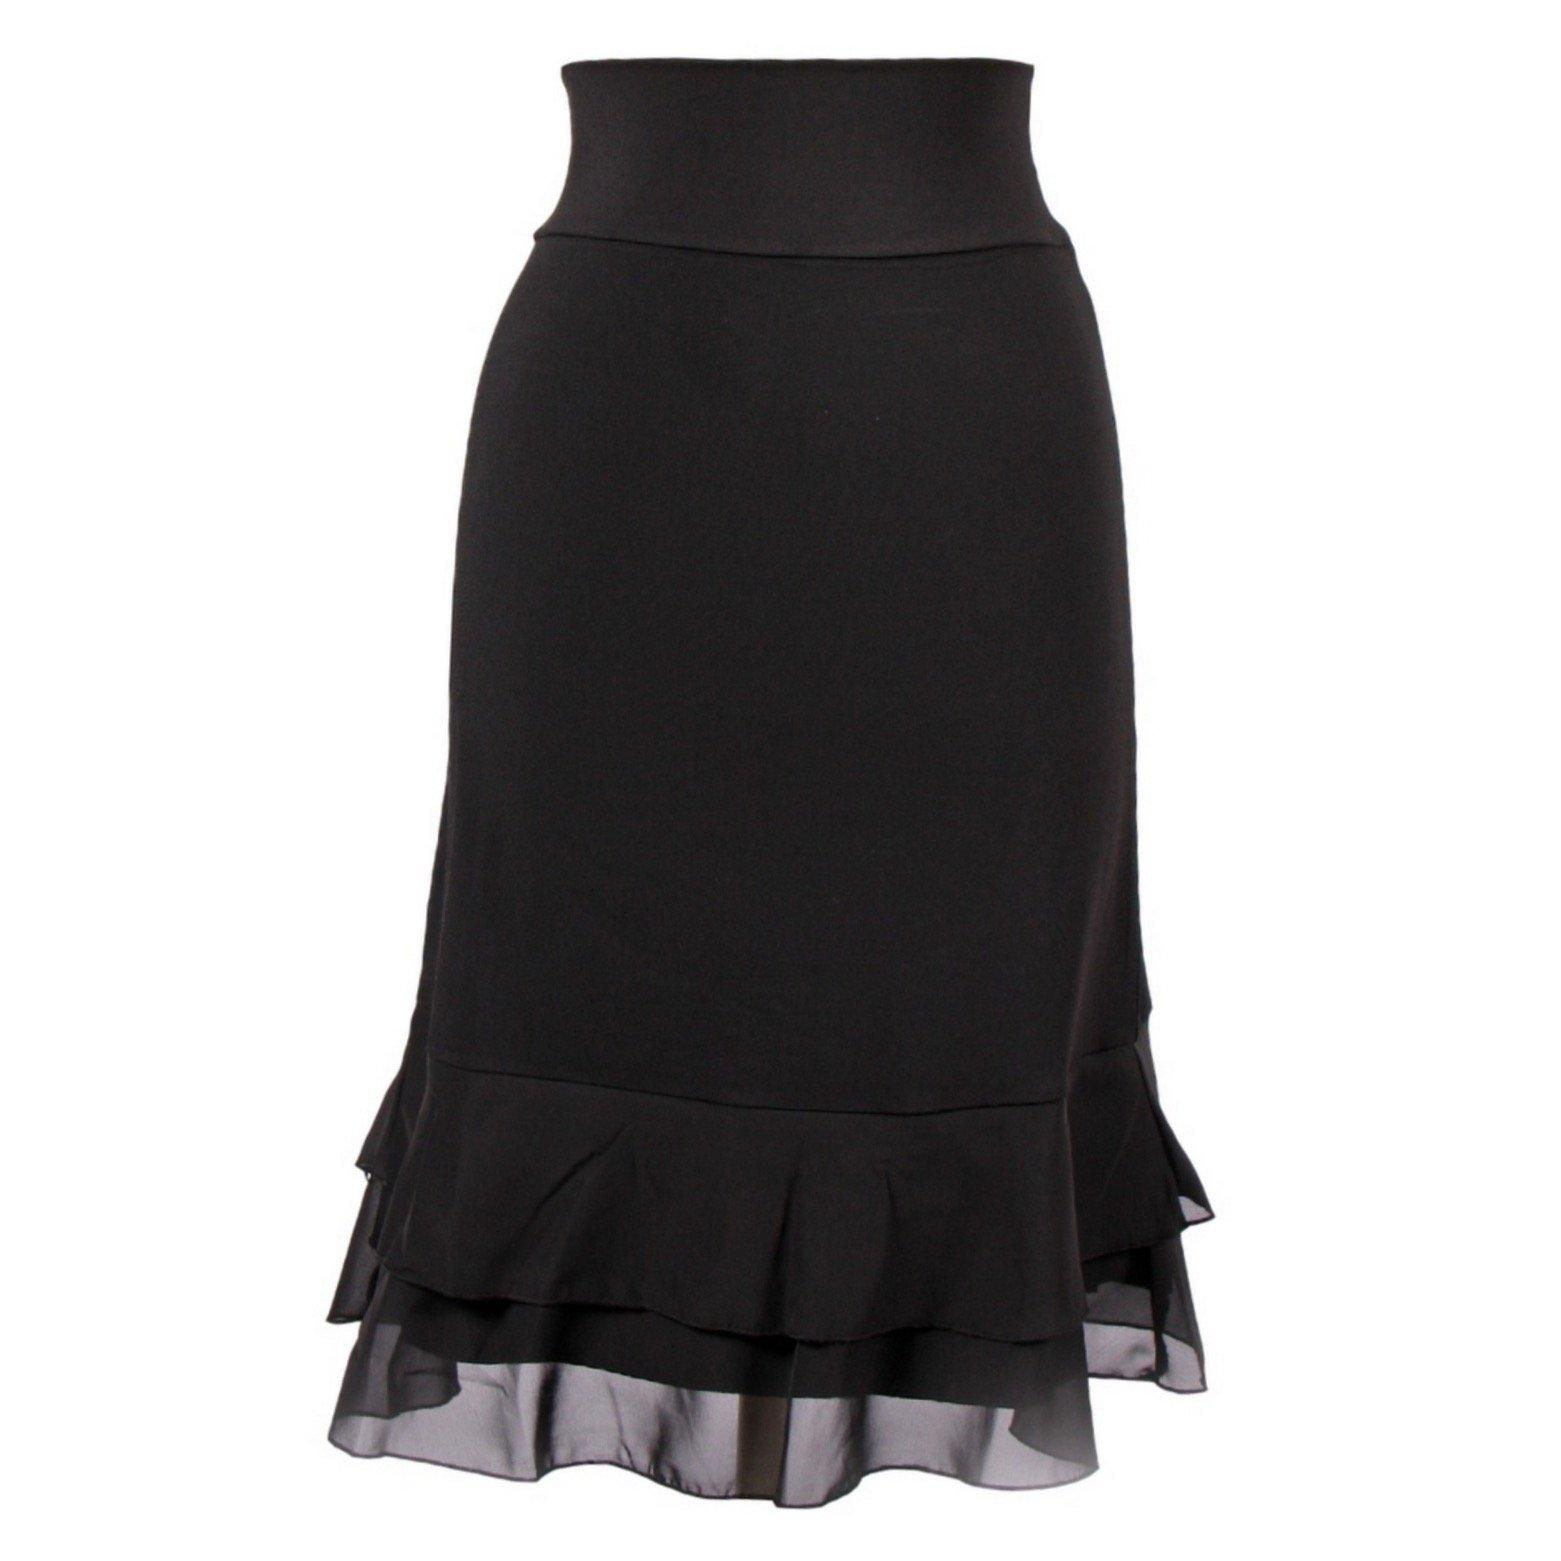 Peekaboo-Chic Iris Chiffon Half Slip Skirt Extender (Black, l/XL)